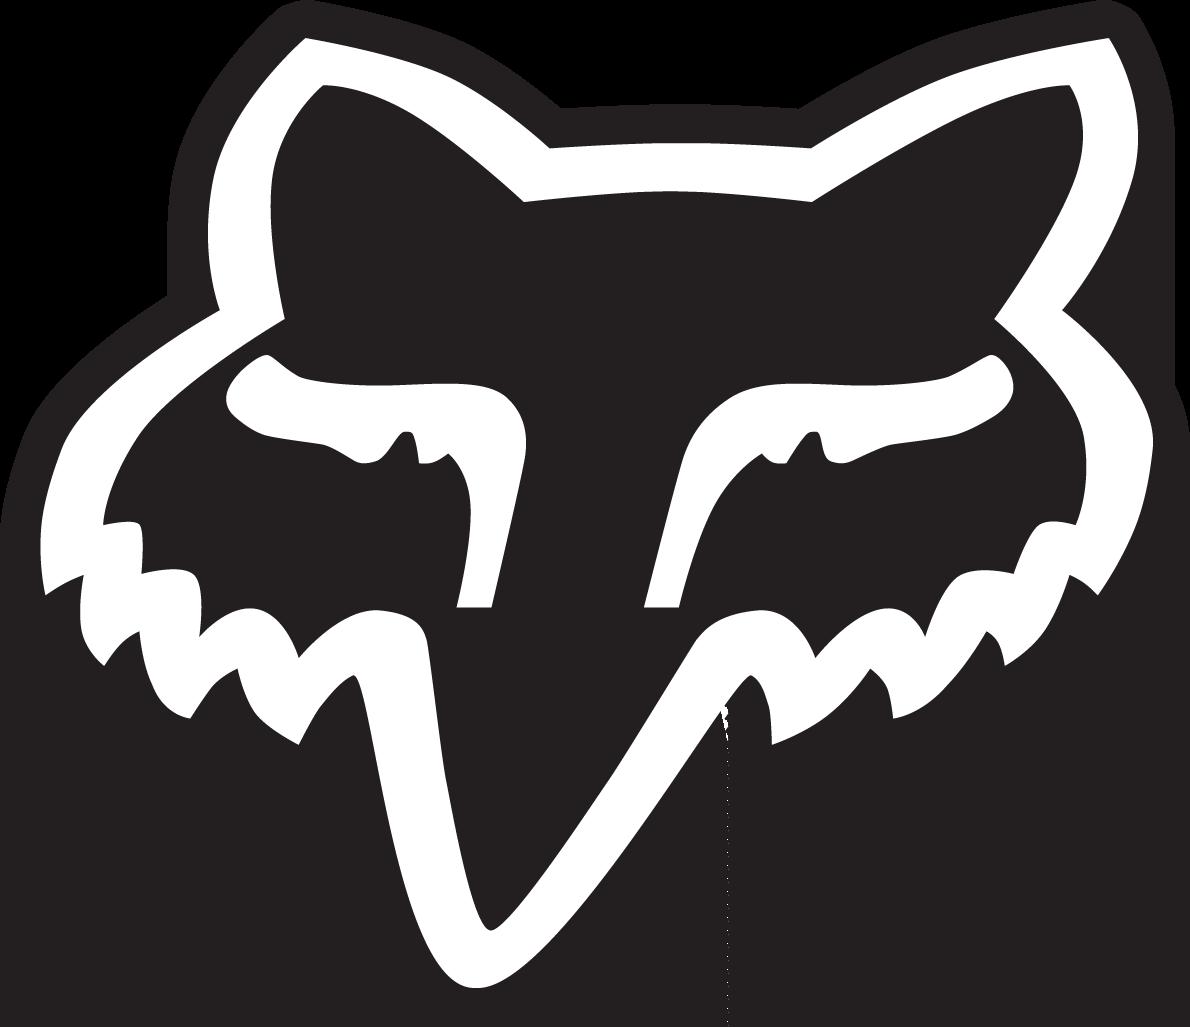 image associ e logo et pub pinterest rh pinterest com au fox racing logo pictures Camo Fox Racing Logo